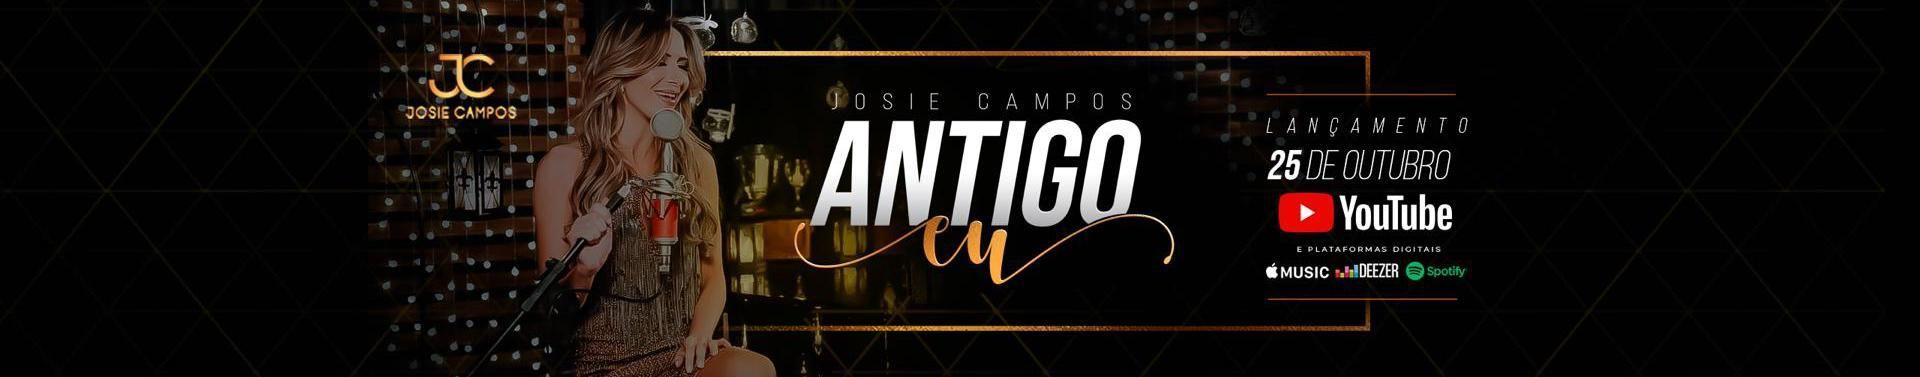 Imagem de capa de Josie Campos